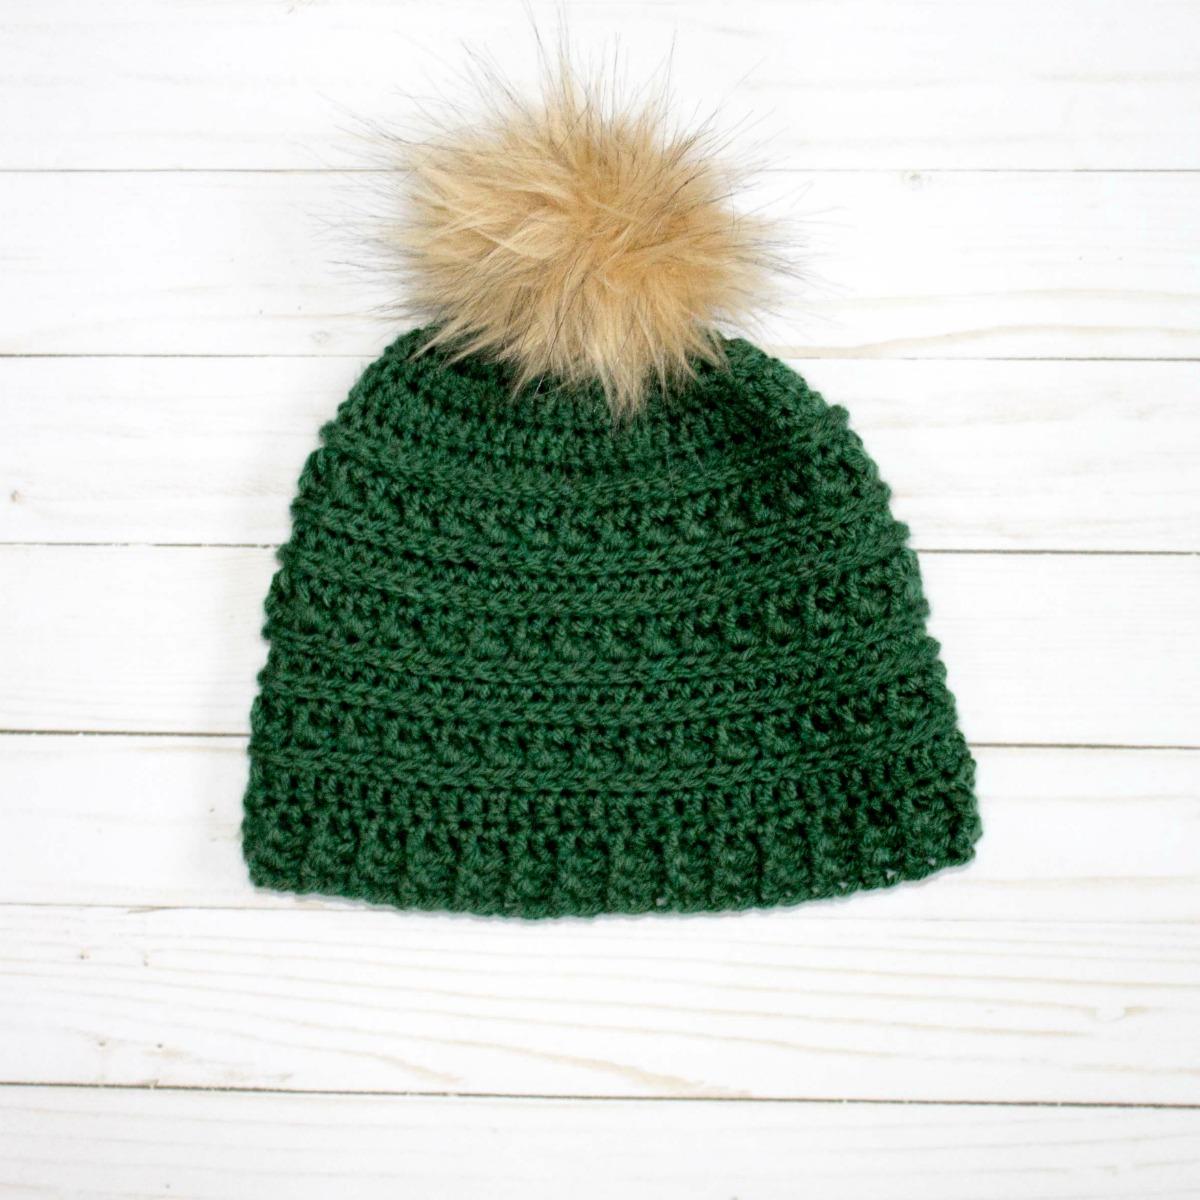 Mountain Ridges Crochet Hat- a free pattern - thefriendlyredfox.com